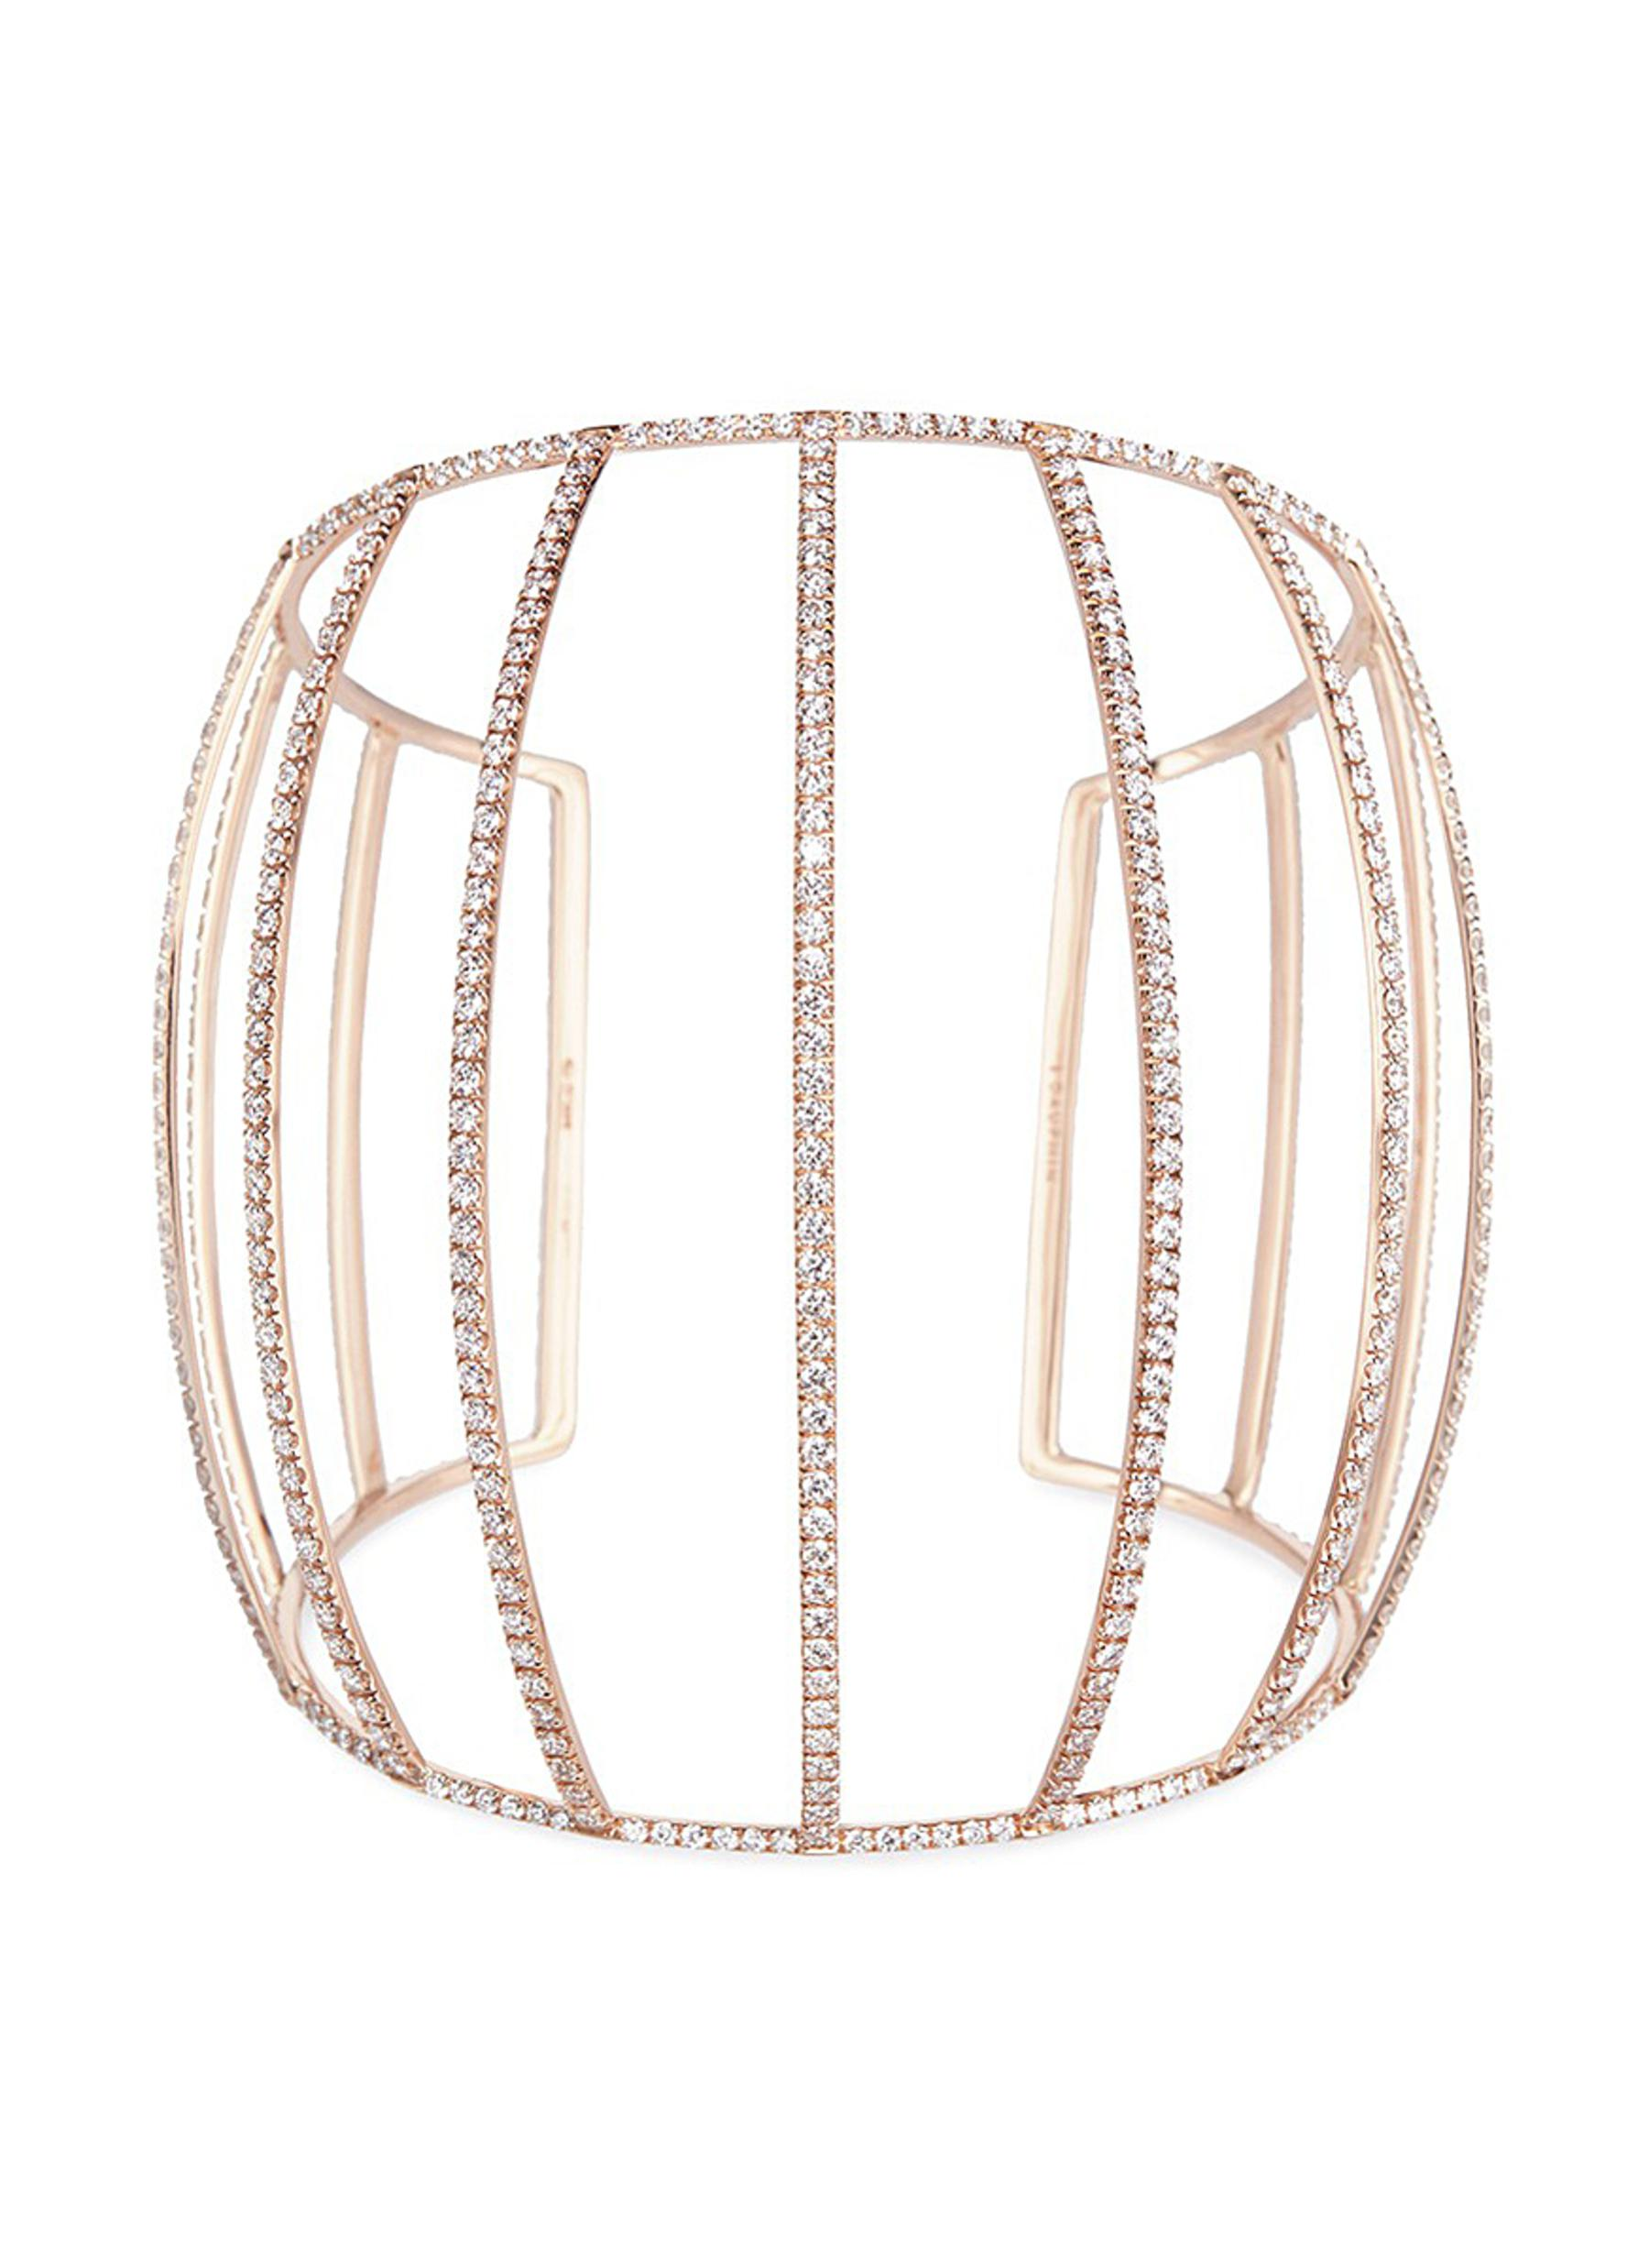 White diamond 18k rose gold caged cuff